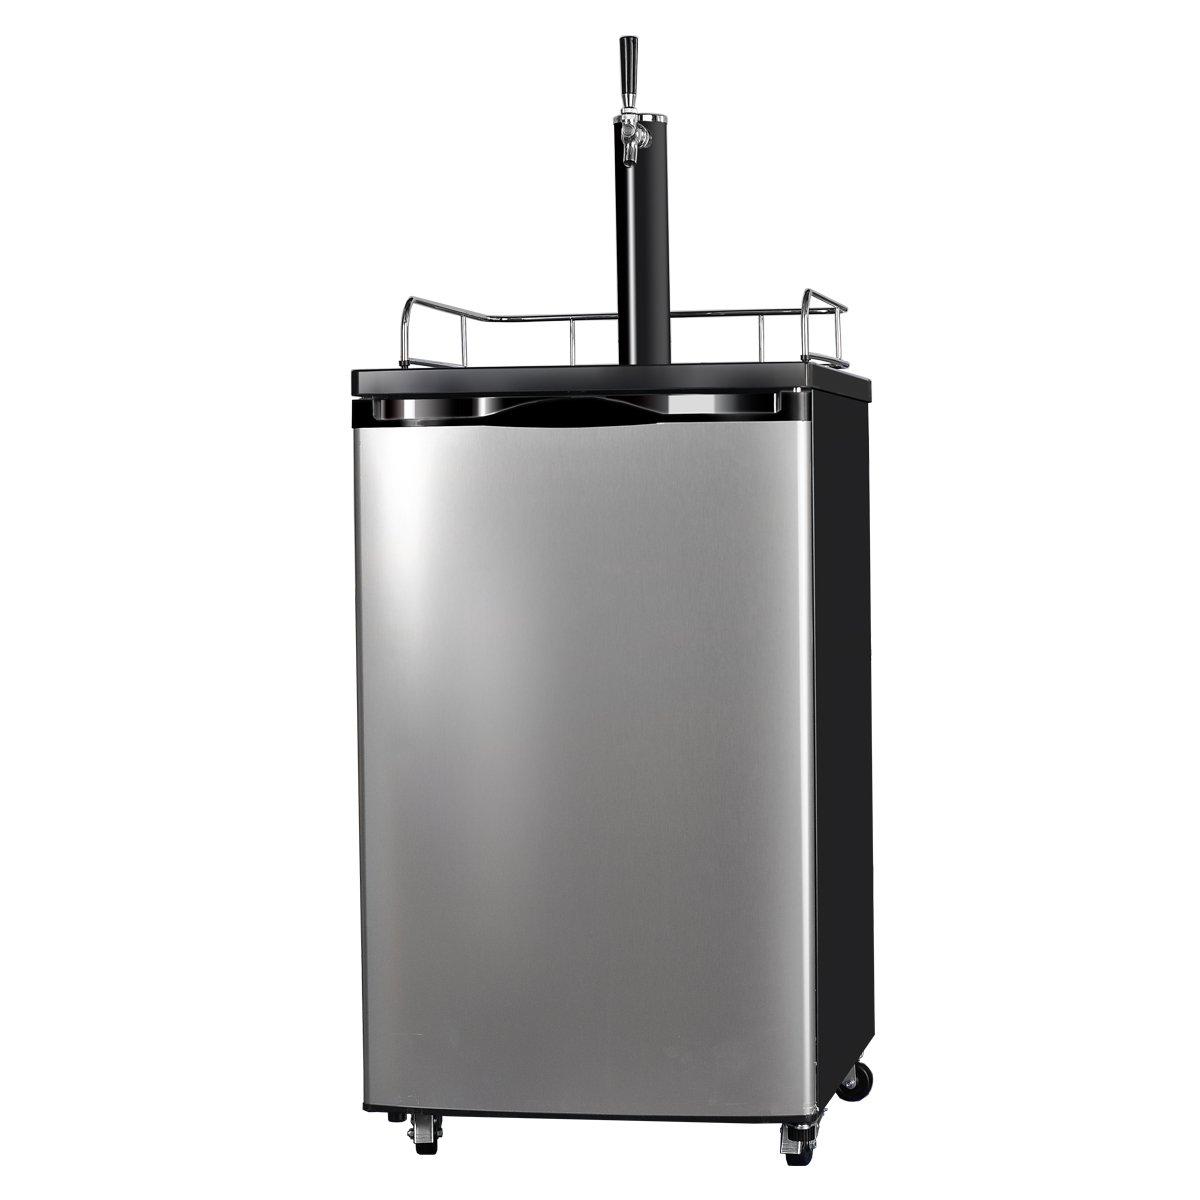 Smad Beer Kegerator Refrigerator Draft Beer Dispenser for Home Party,4.9 Cu.ft.